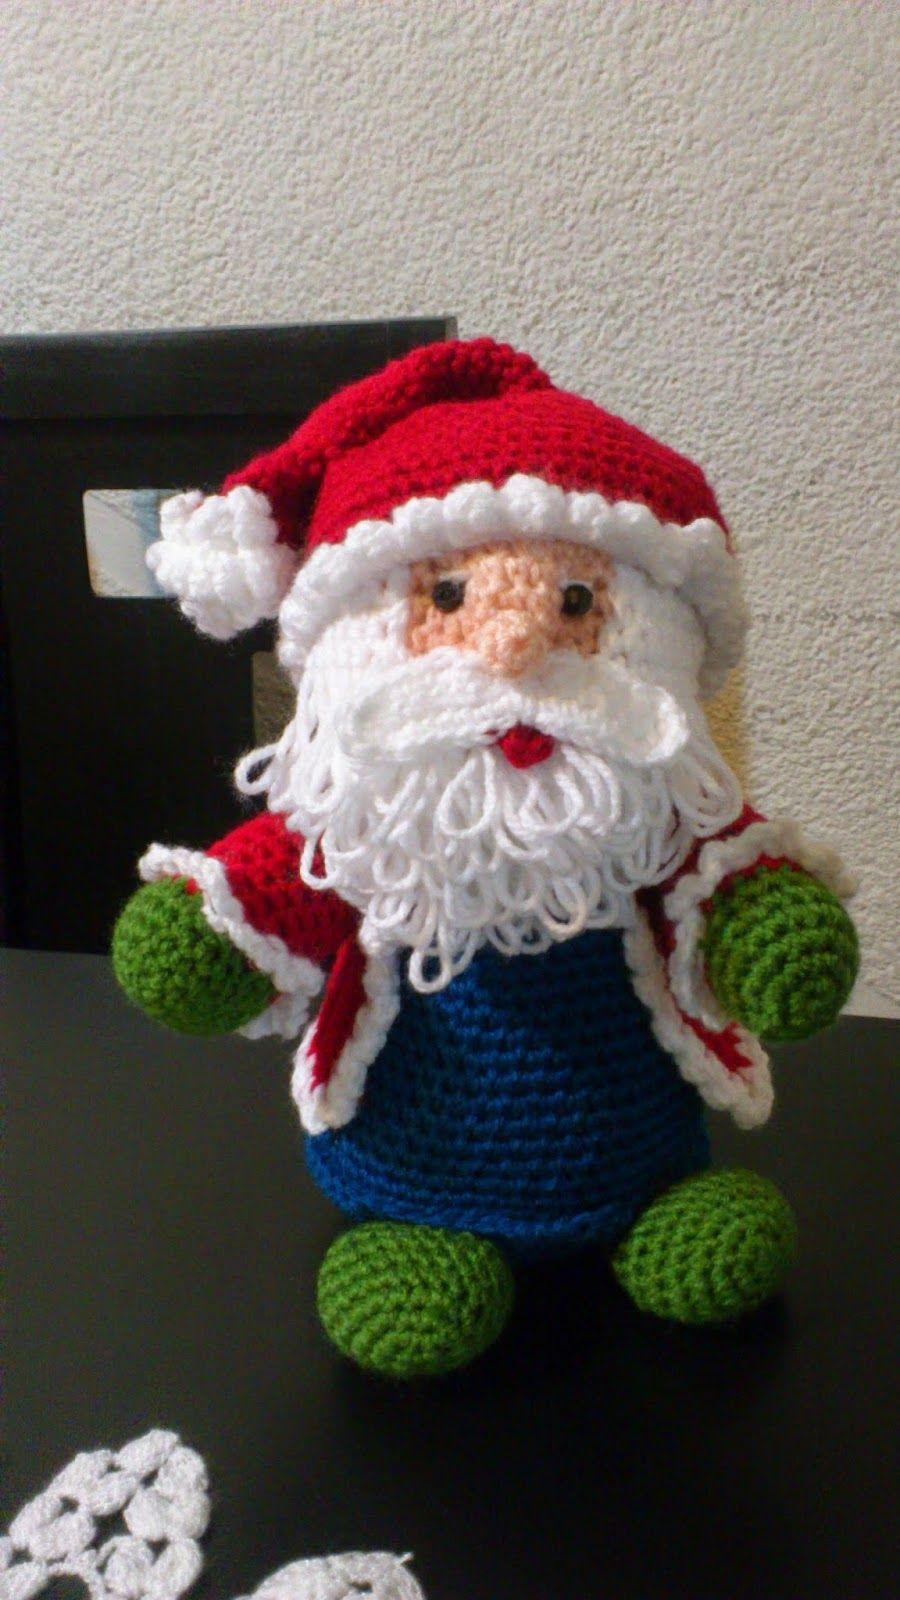 Amigurumi santa claus free crochet pattern tutorial crochet crochet amigurumi free - Decoration au crochet ...